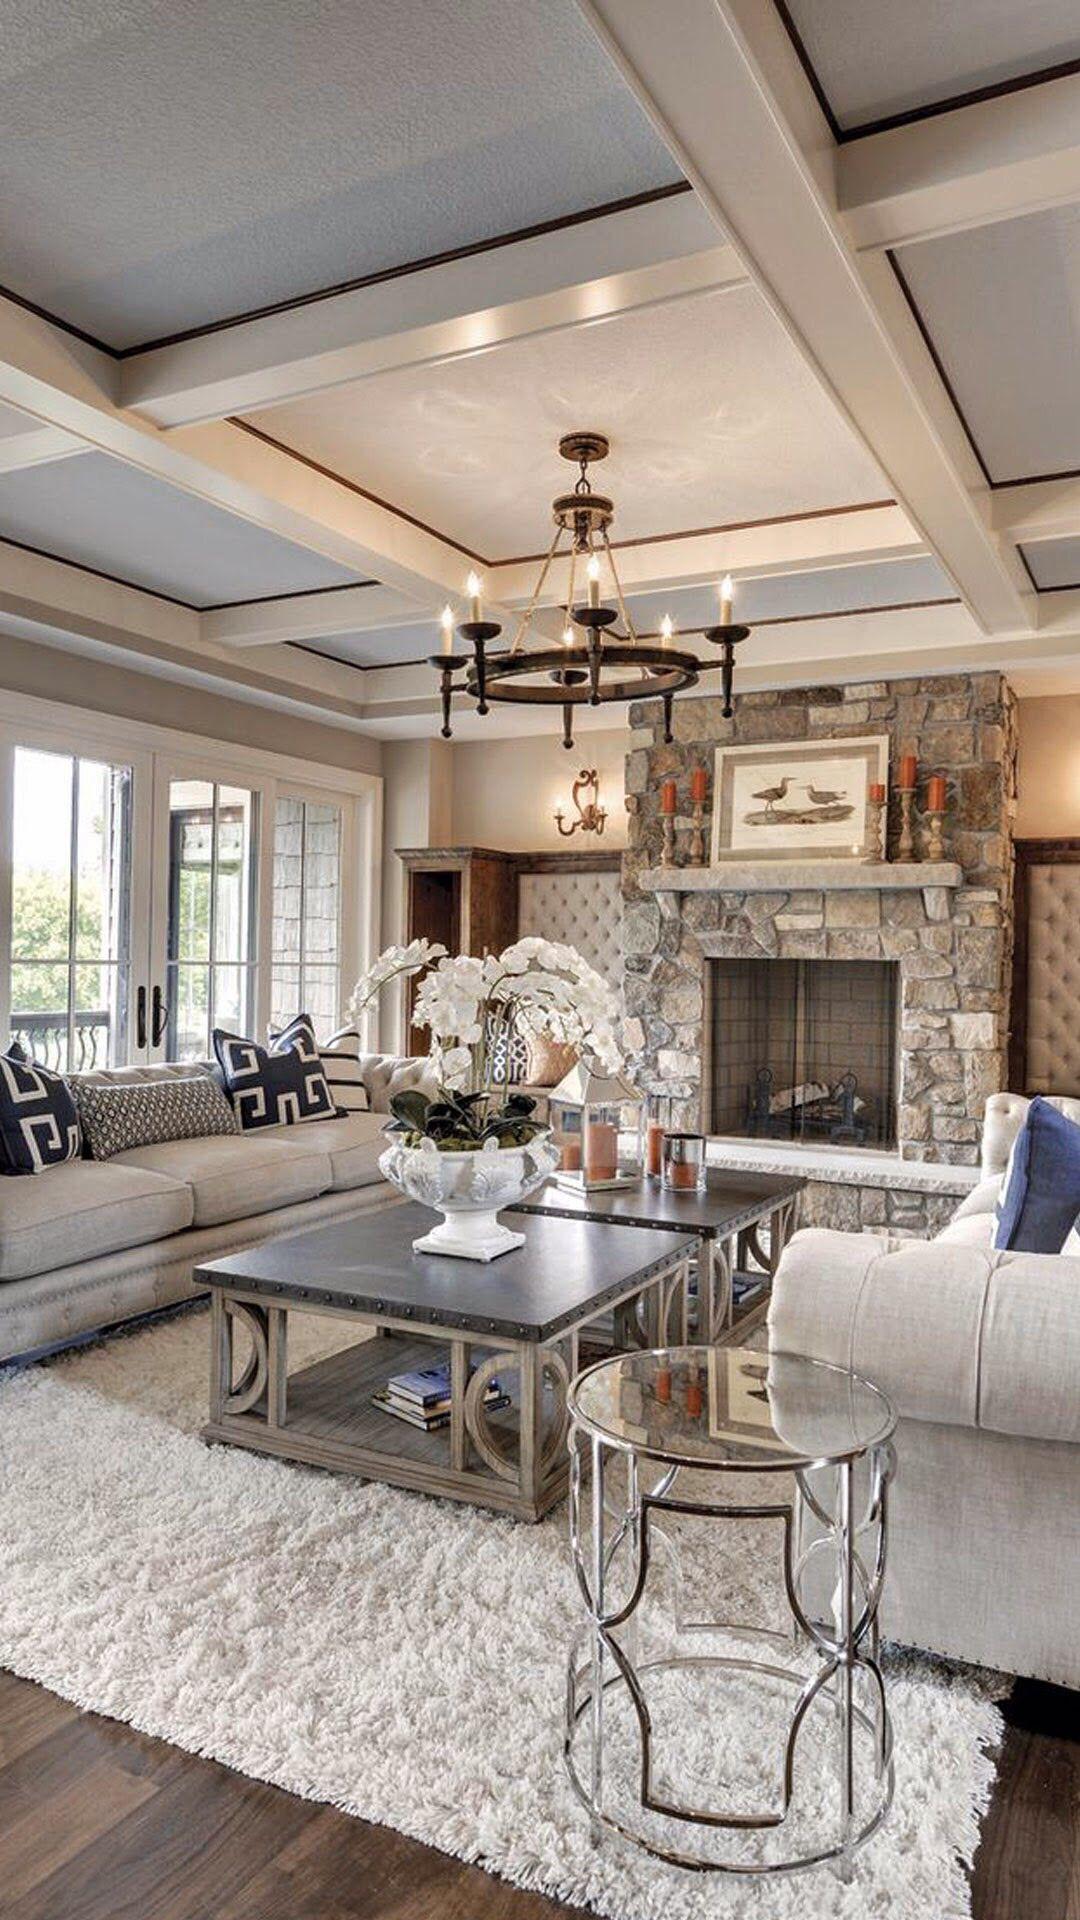 Luxury Interior #Luxurydotcom Design Ideas - via Houzz  My Top Pins1️⃣ ...